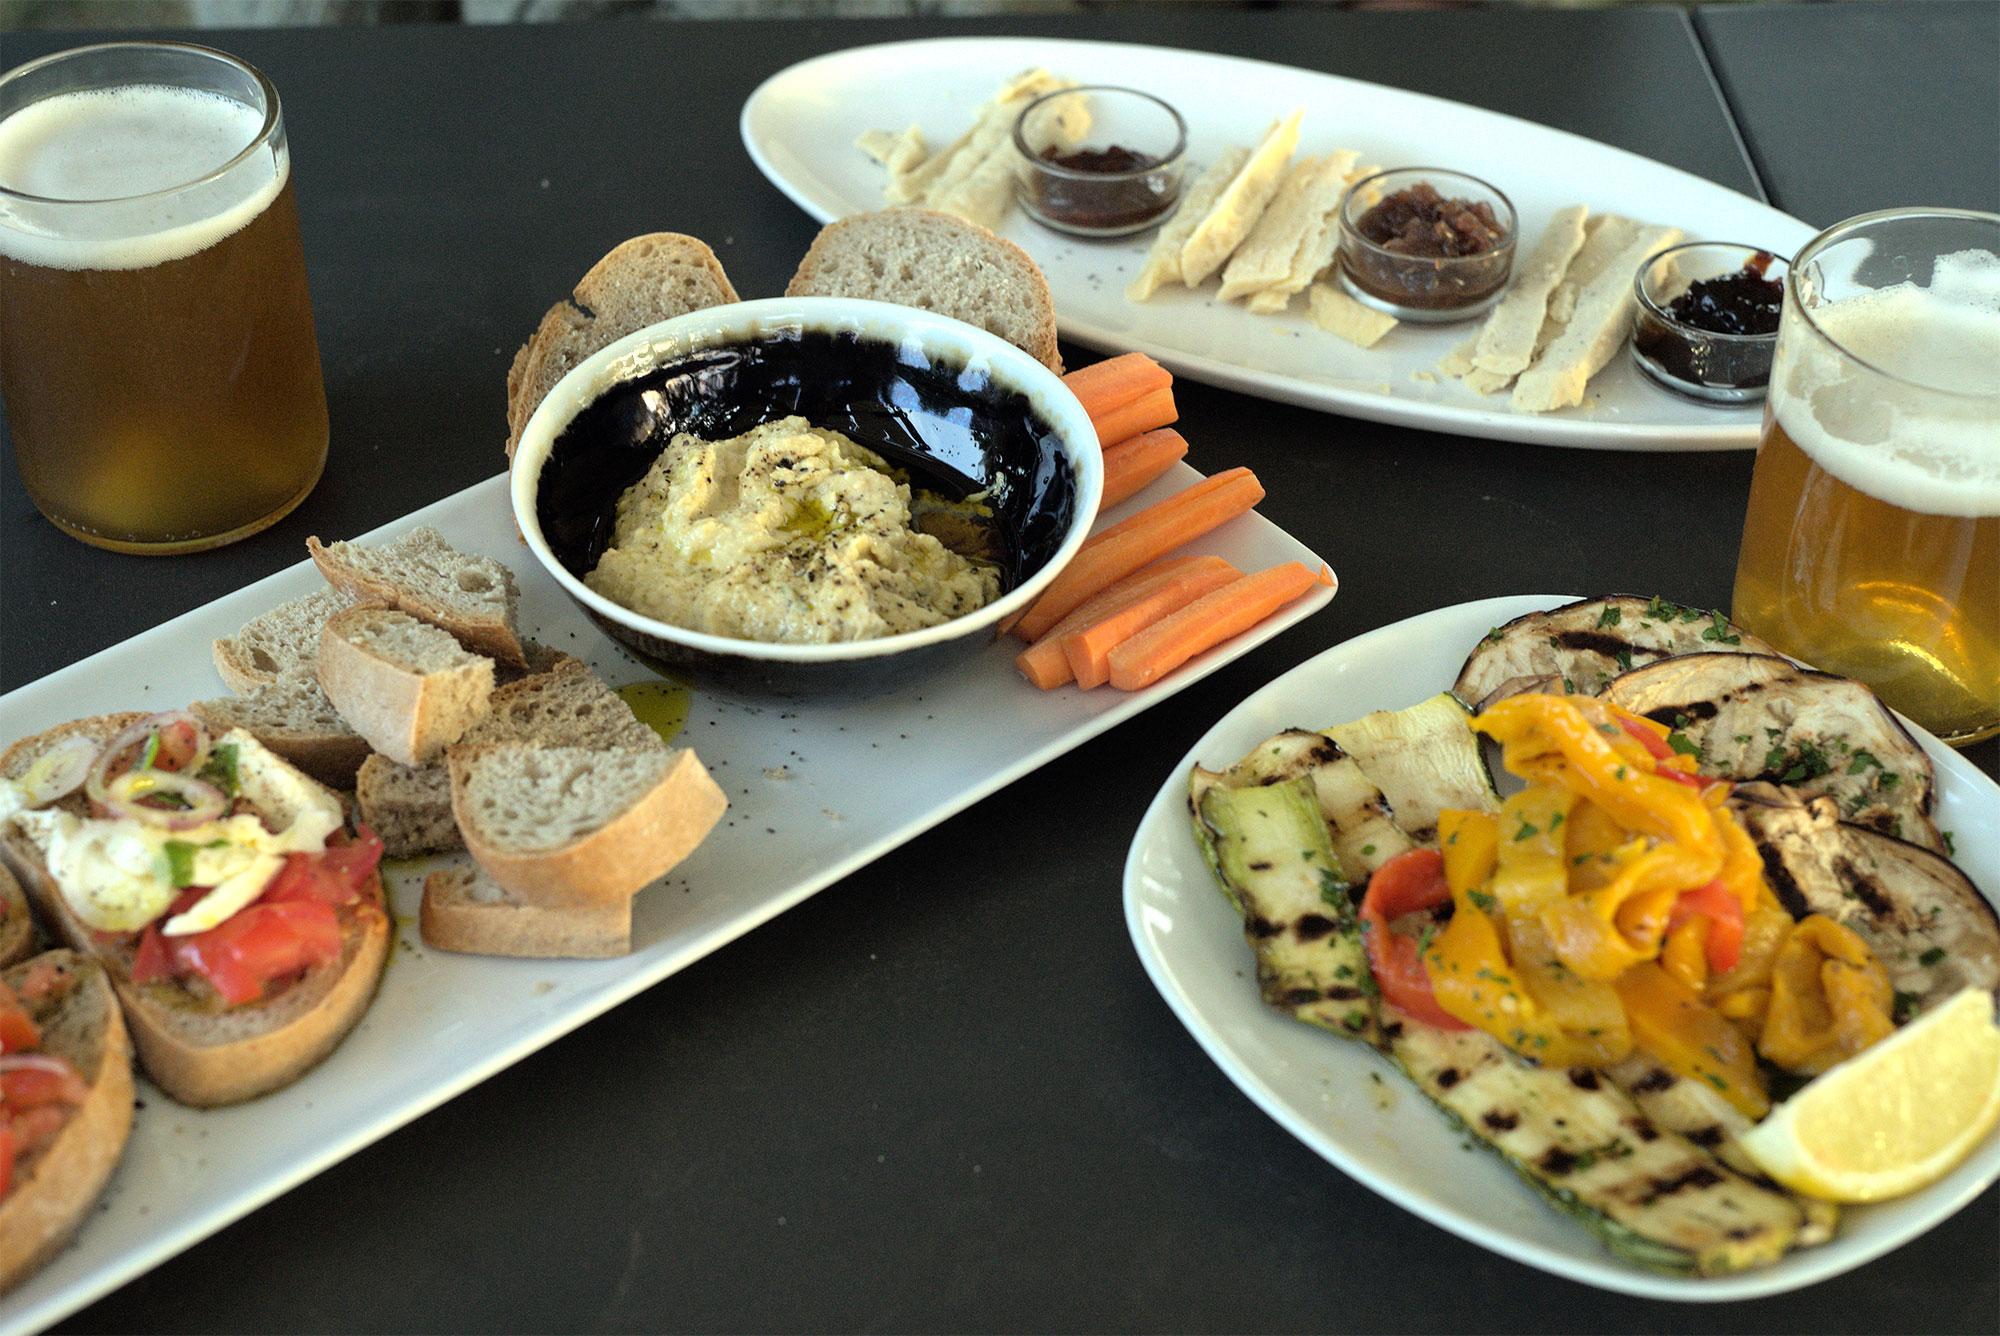 Die vegane Käseplatte schmeckt hervorragend